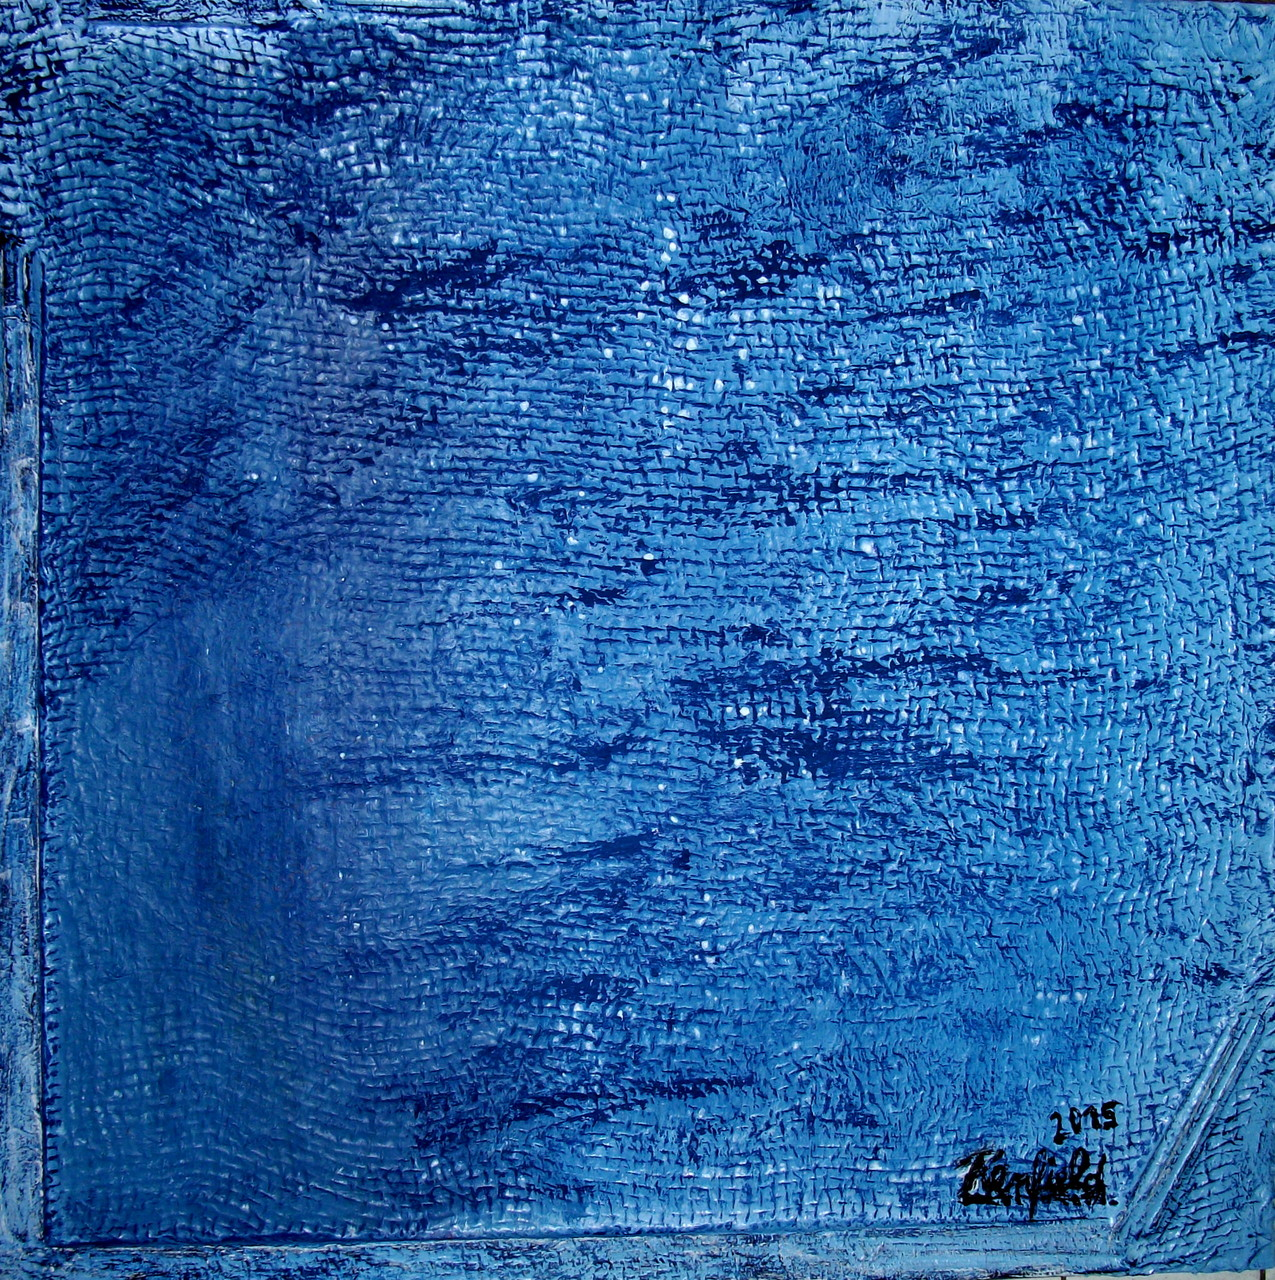 Blue 5 (60 x 60) Acryl auf Leinwand mit Struktur Kaufpreis